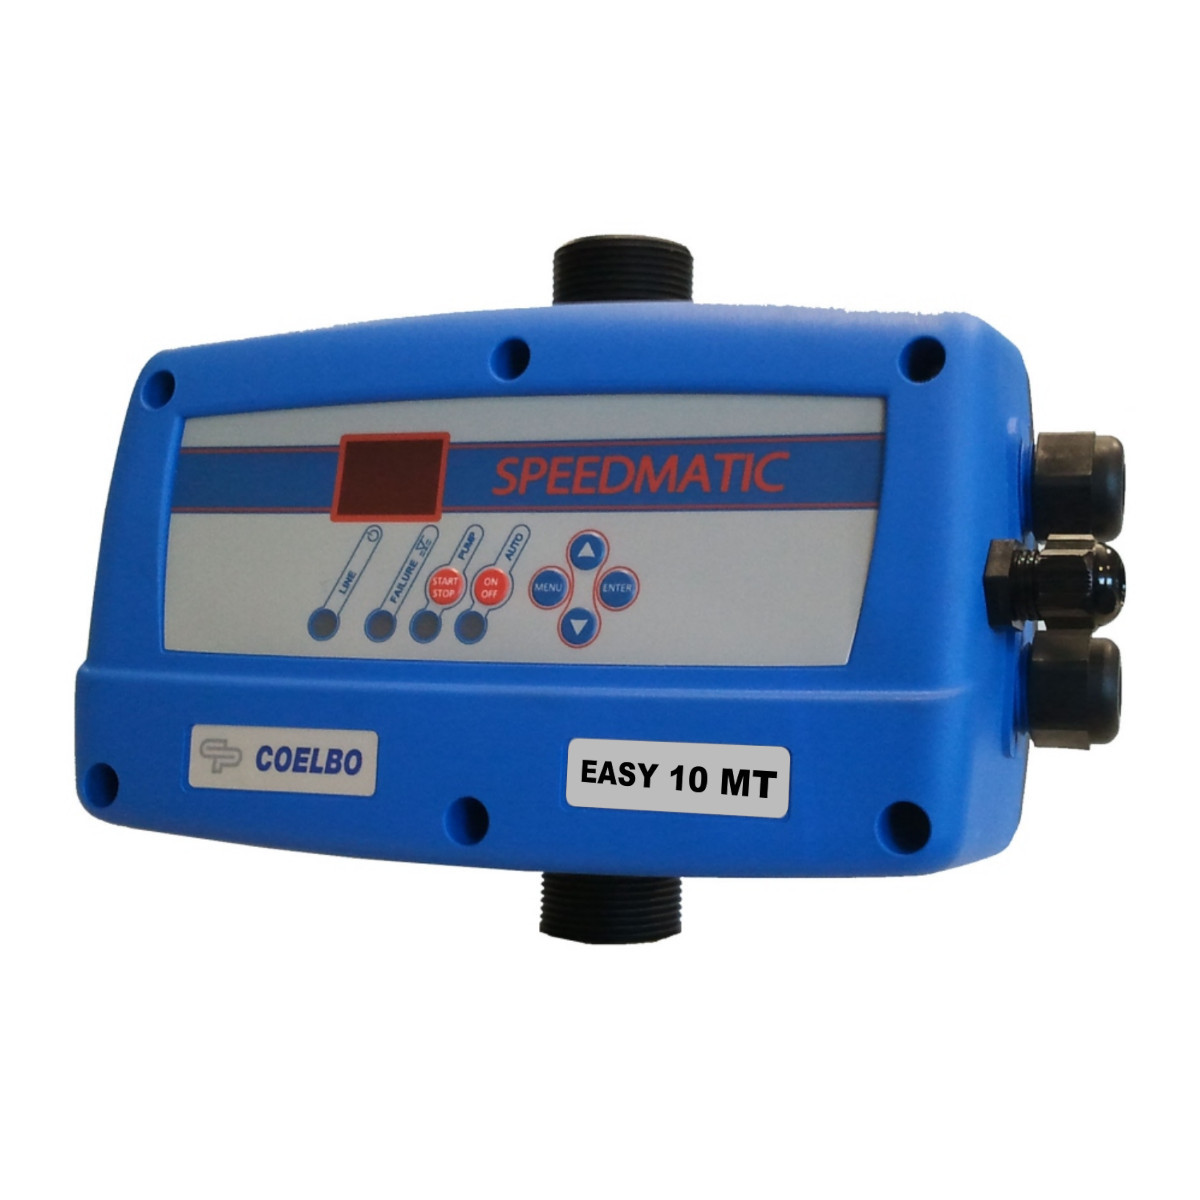 Coelbo Speedmatic Easy 12 - Контроллер давления